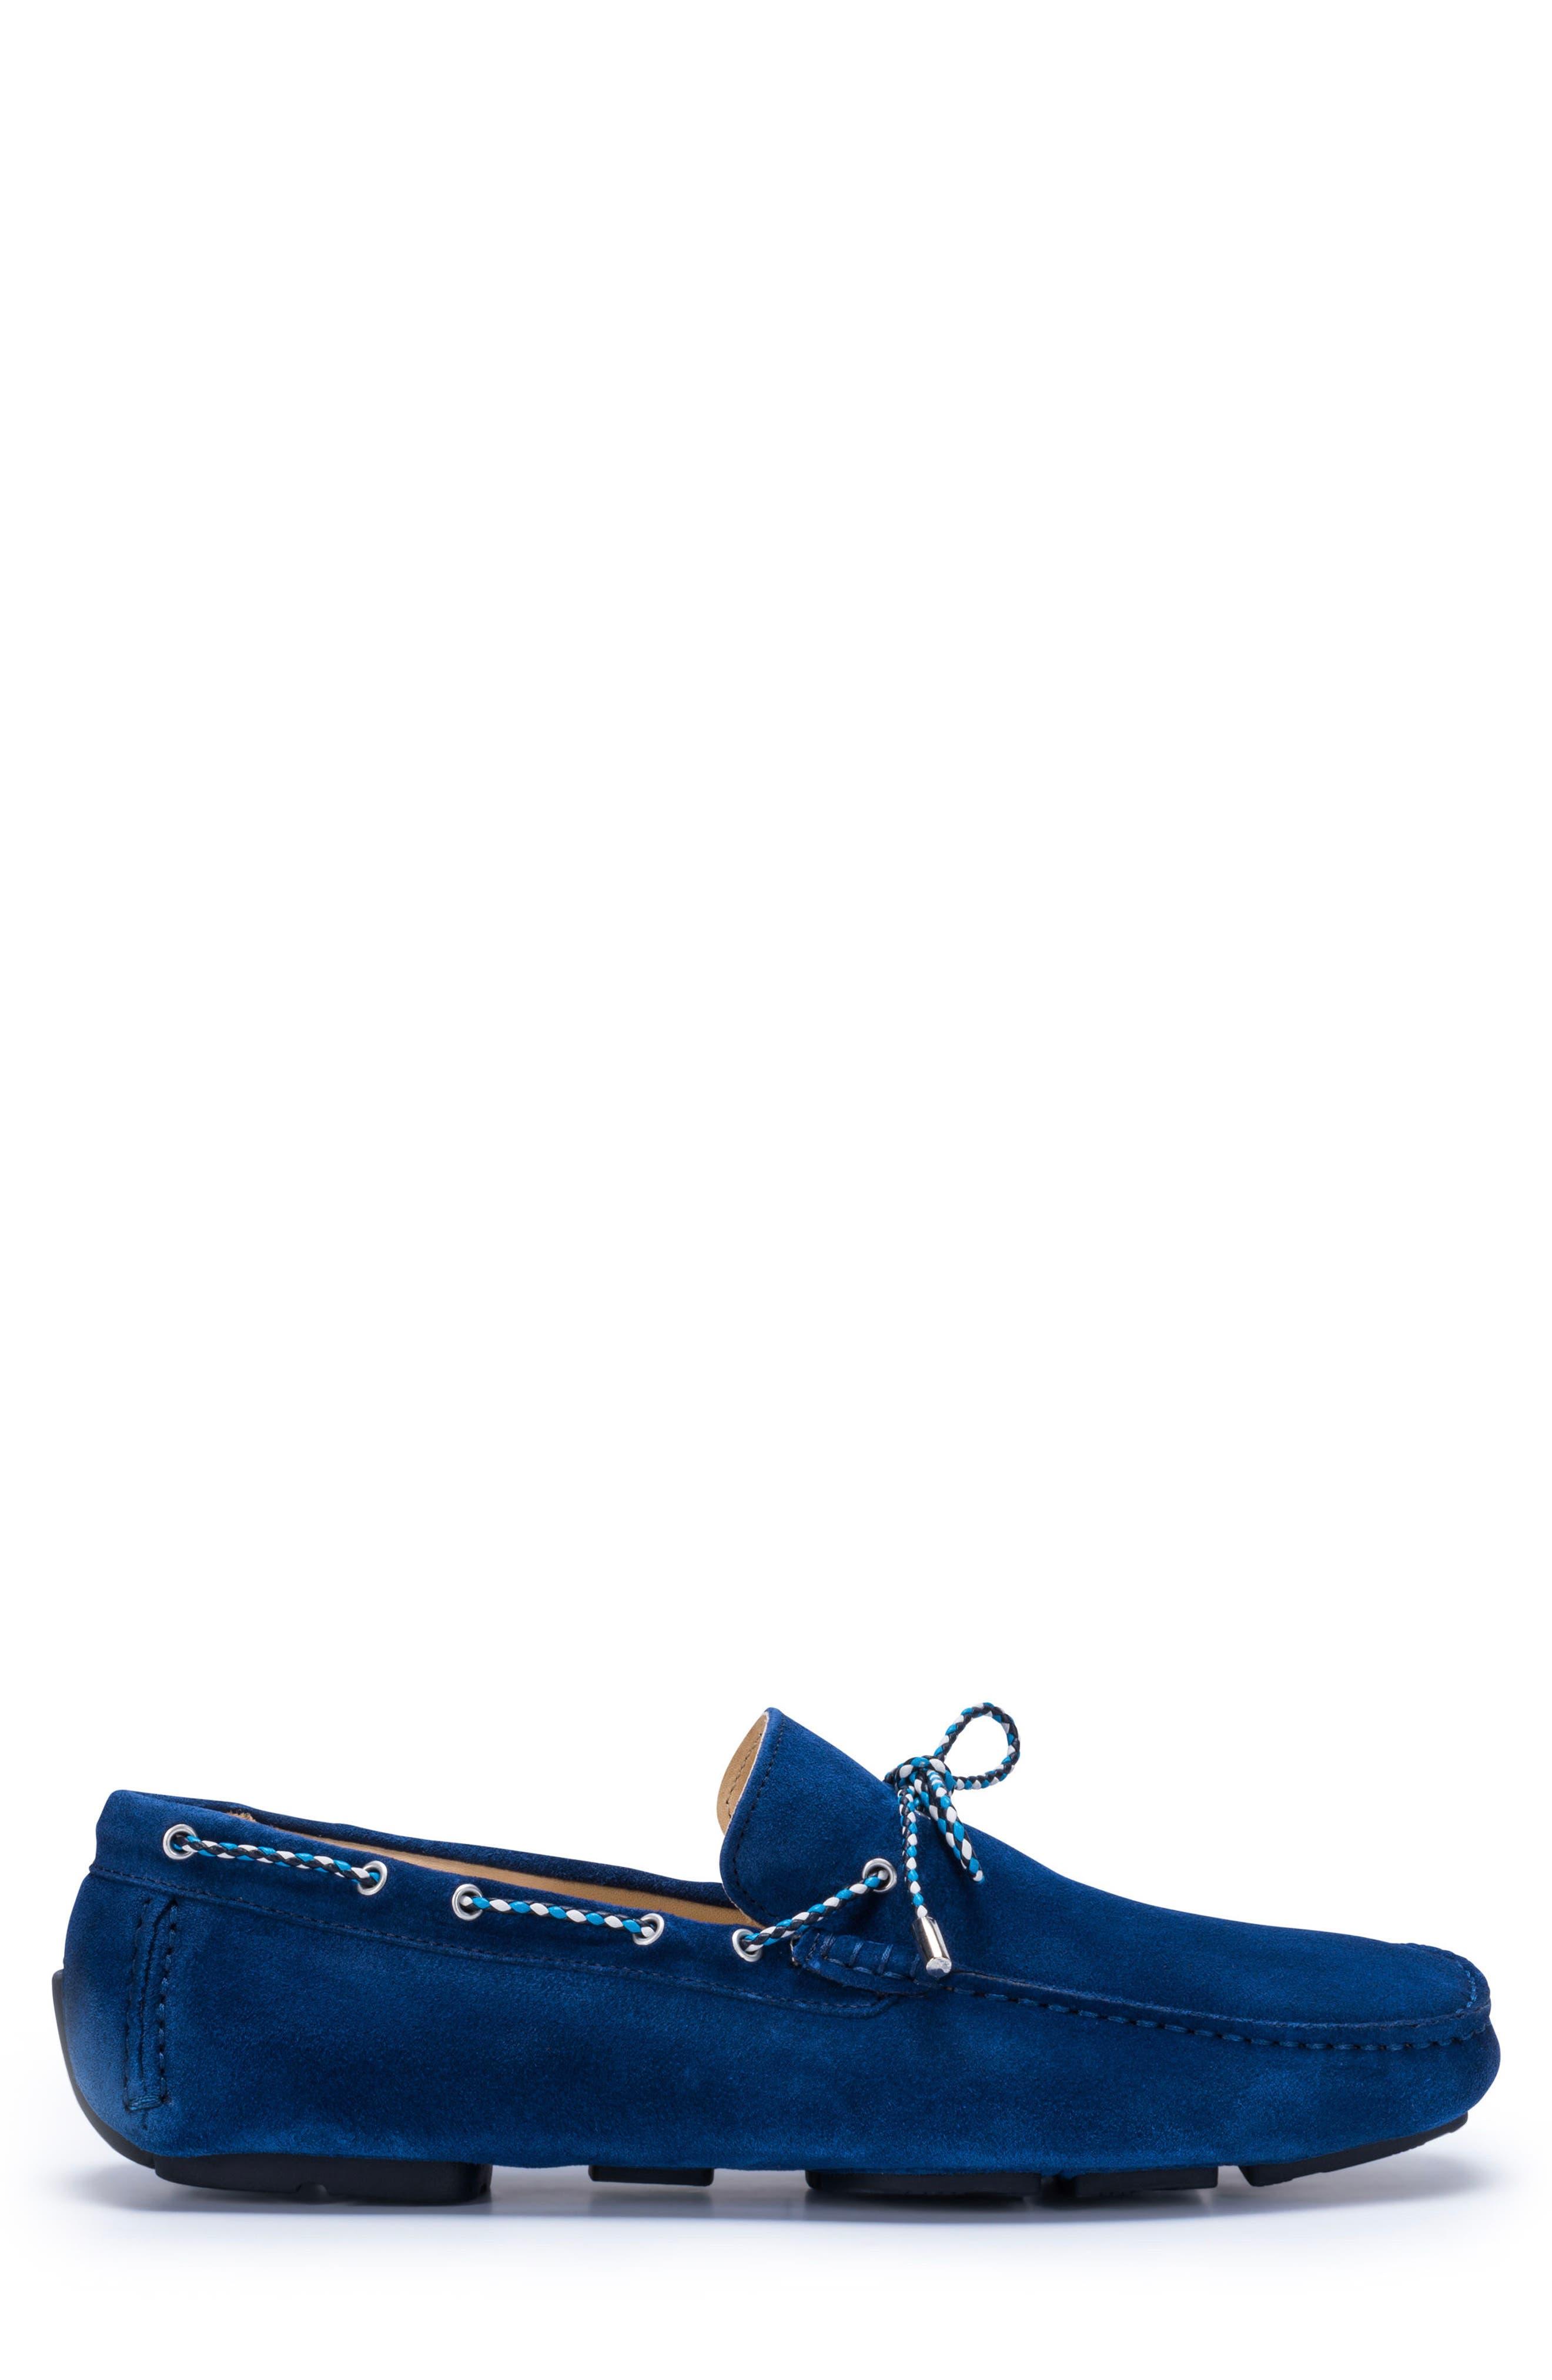 Alternate Image 3  - Bugatchi 'Monte Carlo' Driving Shoe (Men)